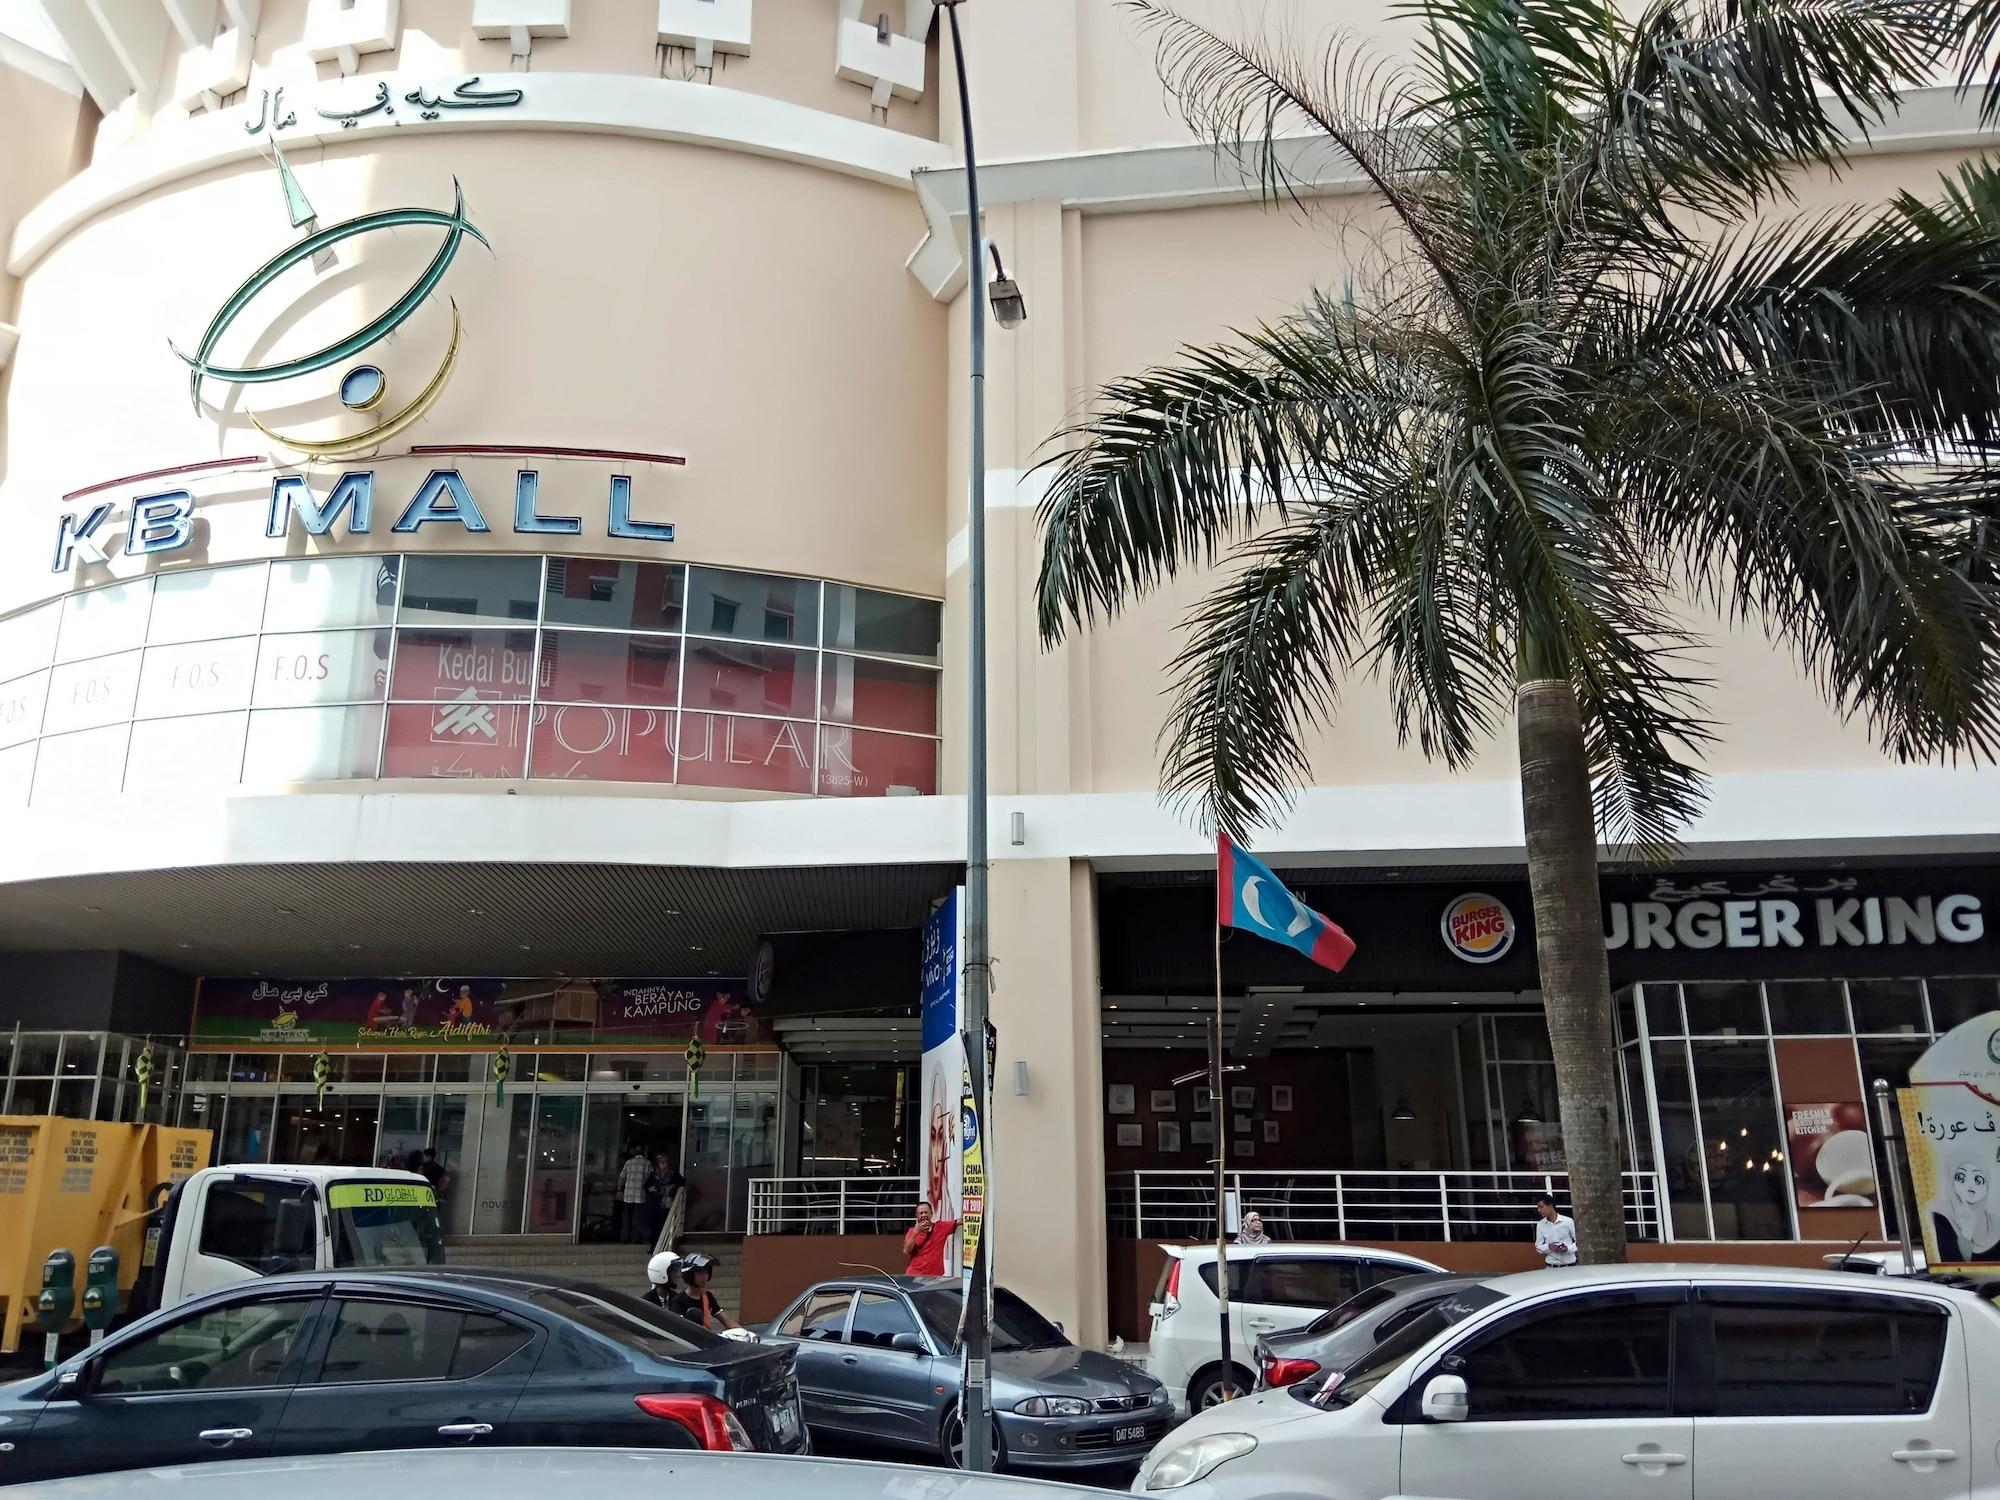 KBCC Service Apartment by iHost, Kota Bharu